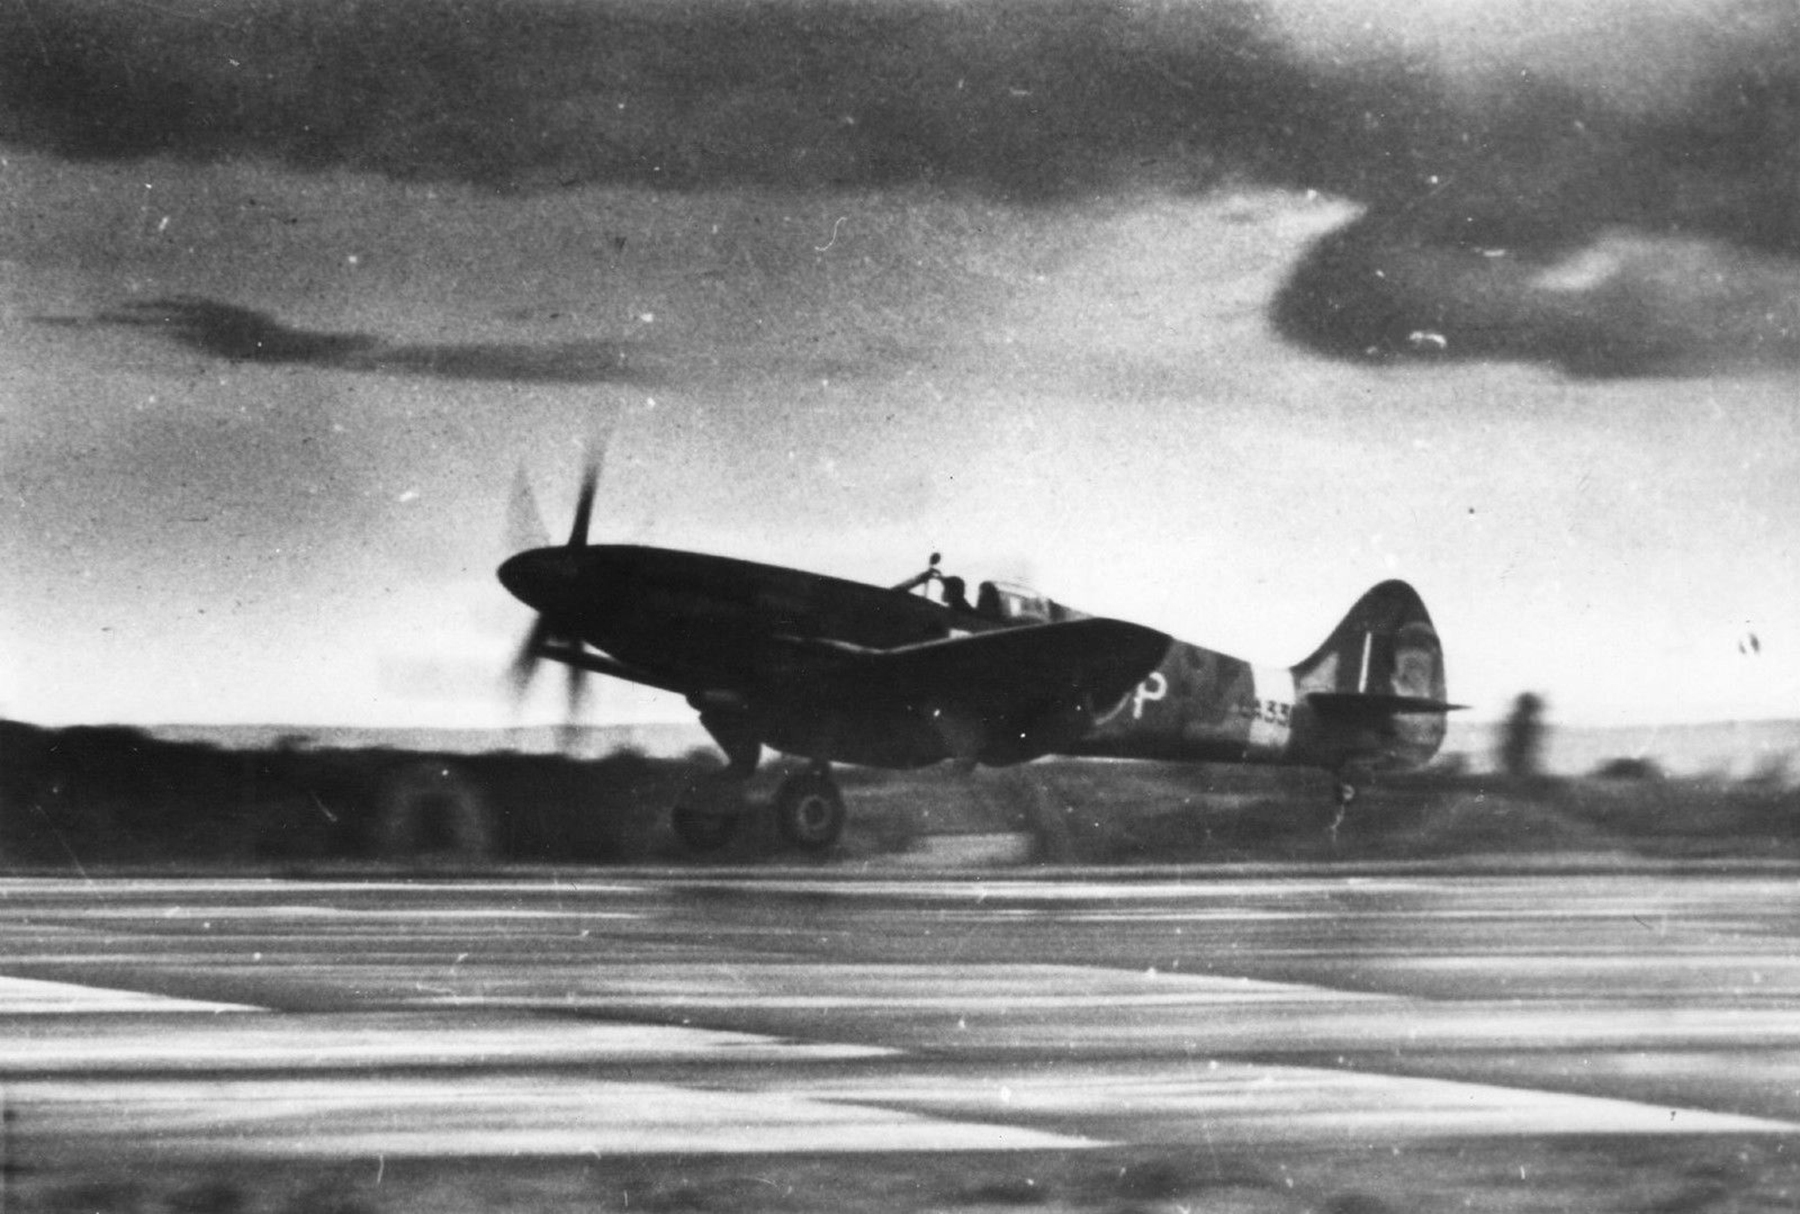 Spitfire F21 LA331 landing 01